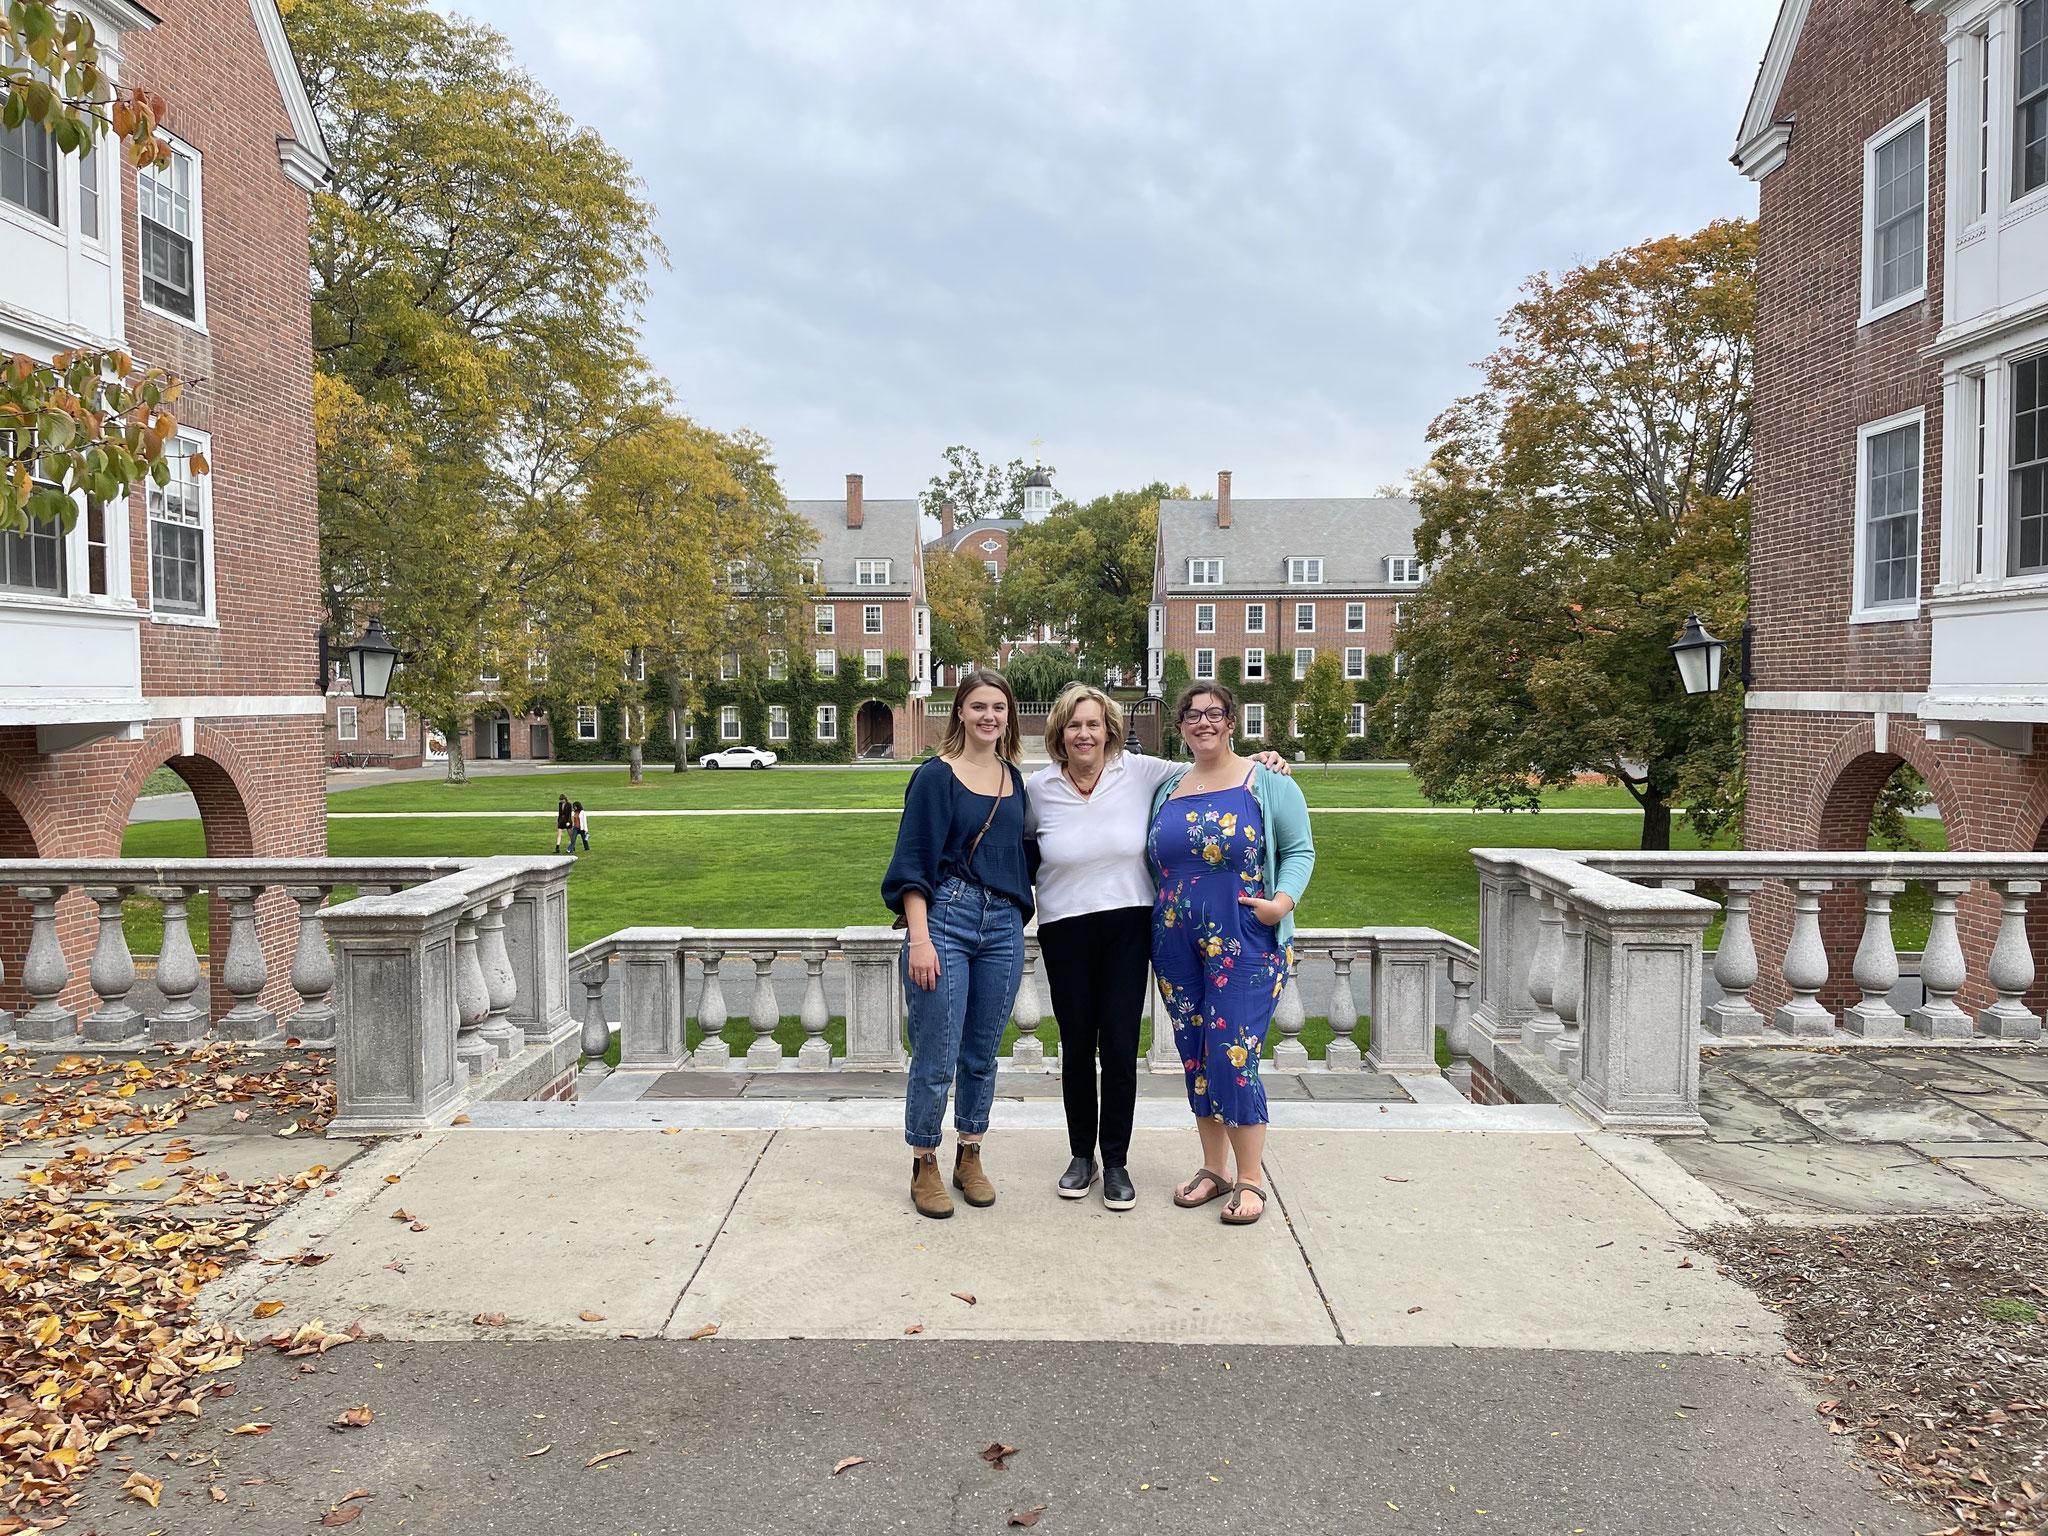 Kate Kagel, Lorraine, & Aimee, Kate's friend, 10-16-21, on the Quadrangle.